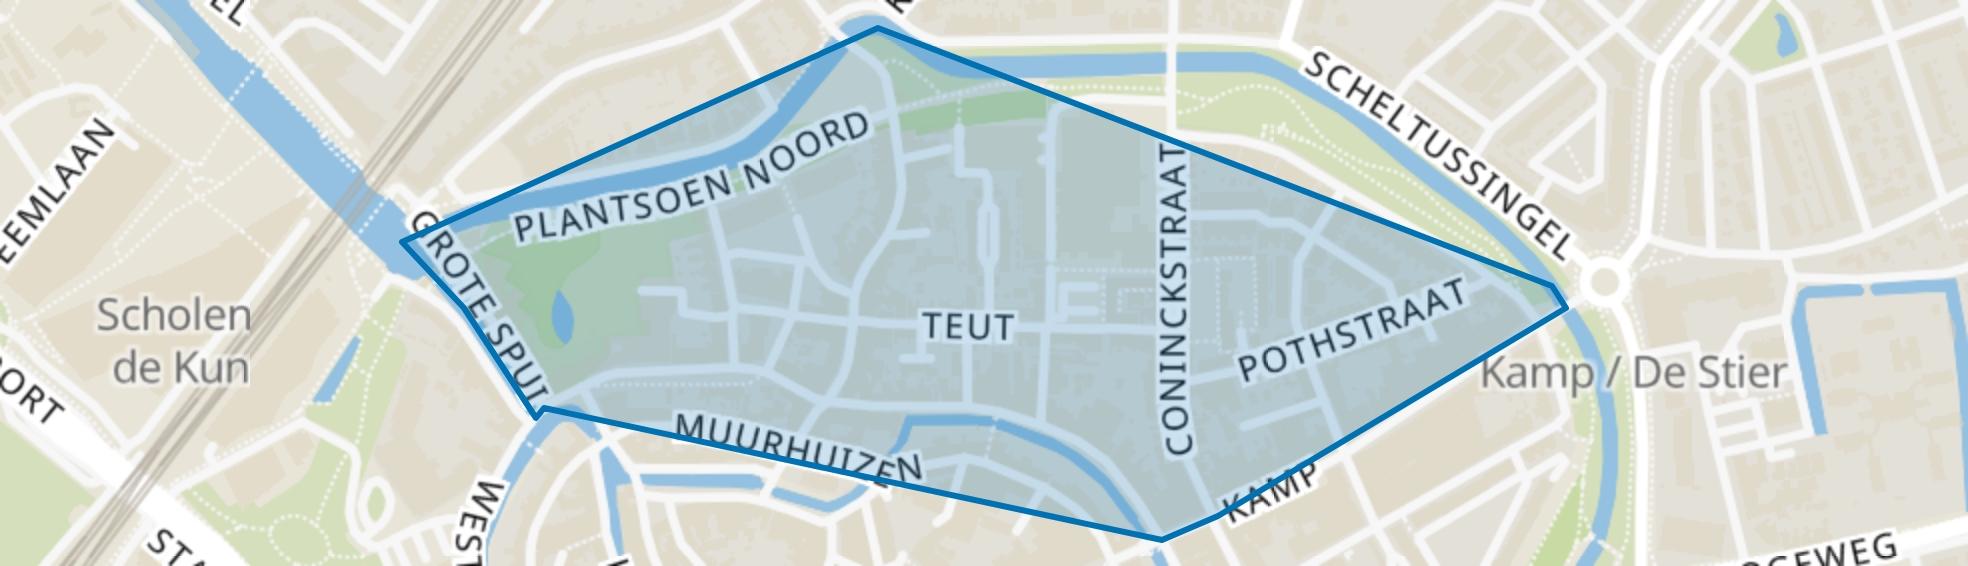 Coninckstraat, Amersfoort map